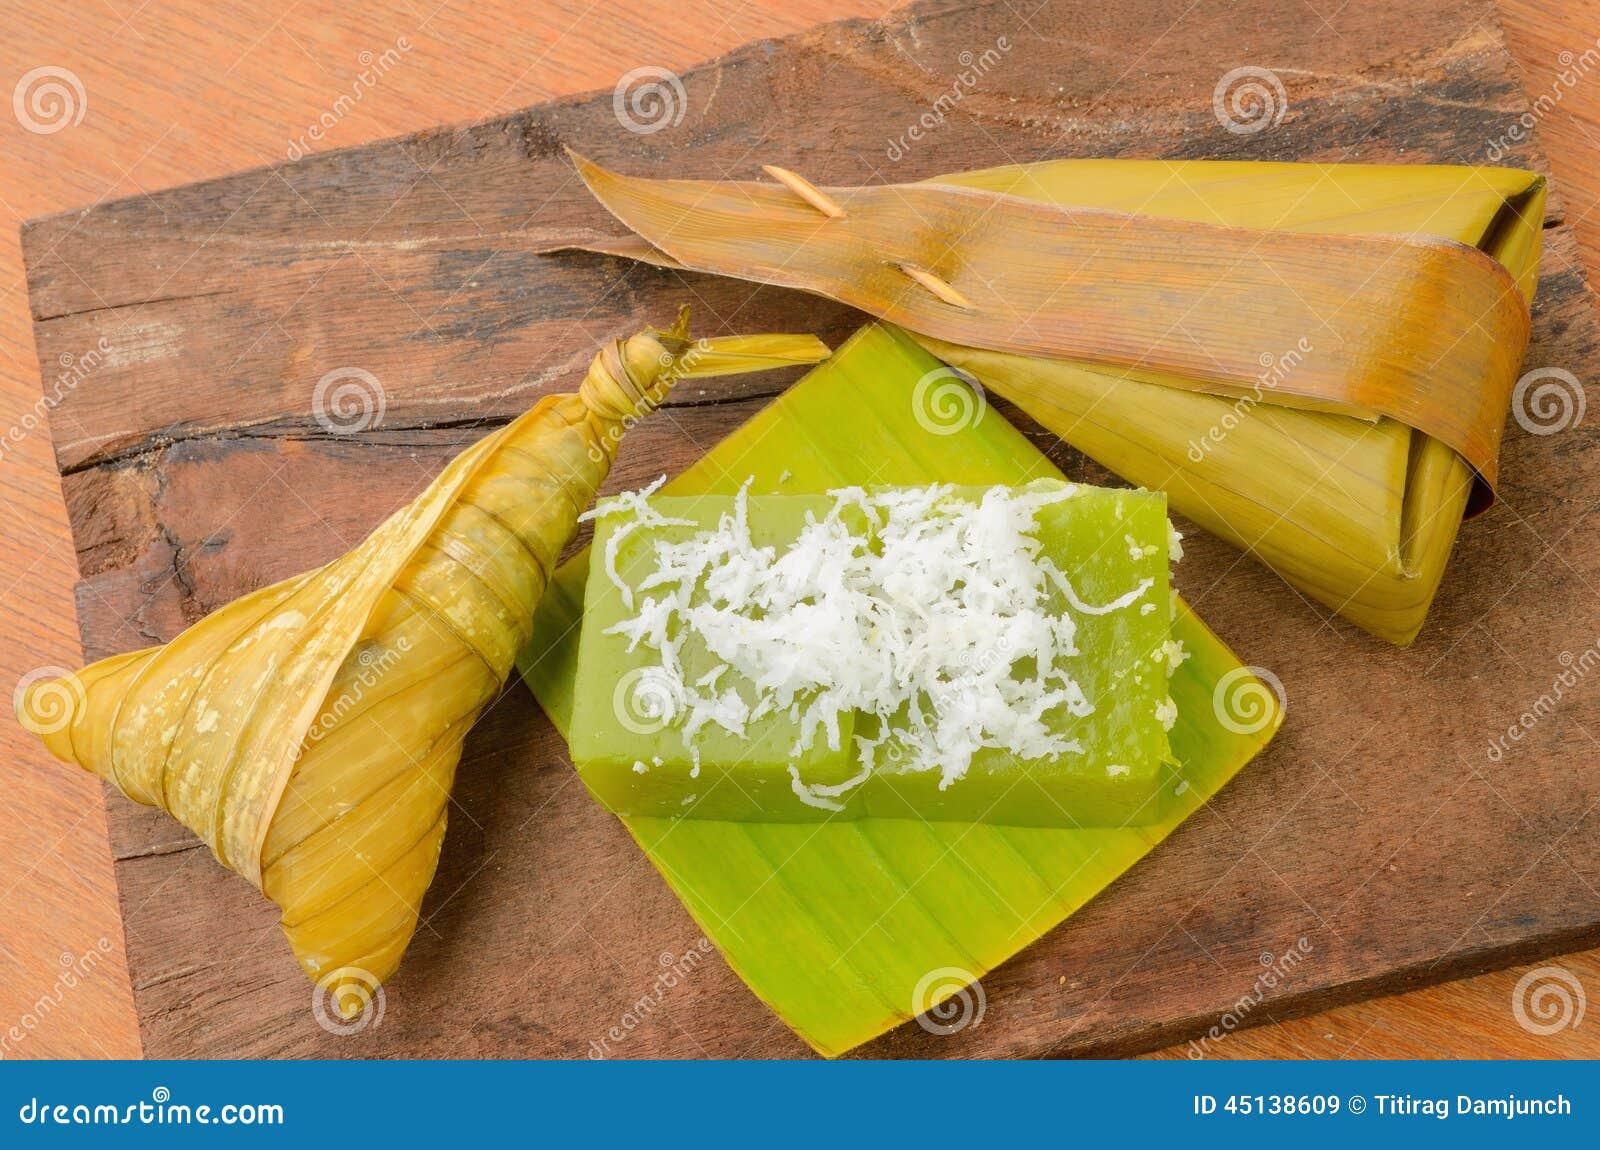 thai dessert sticky rice wrapped in banana leaf on wood. Black Bedroom Furniture Sets. Home Design Ideas